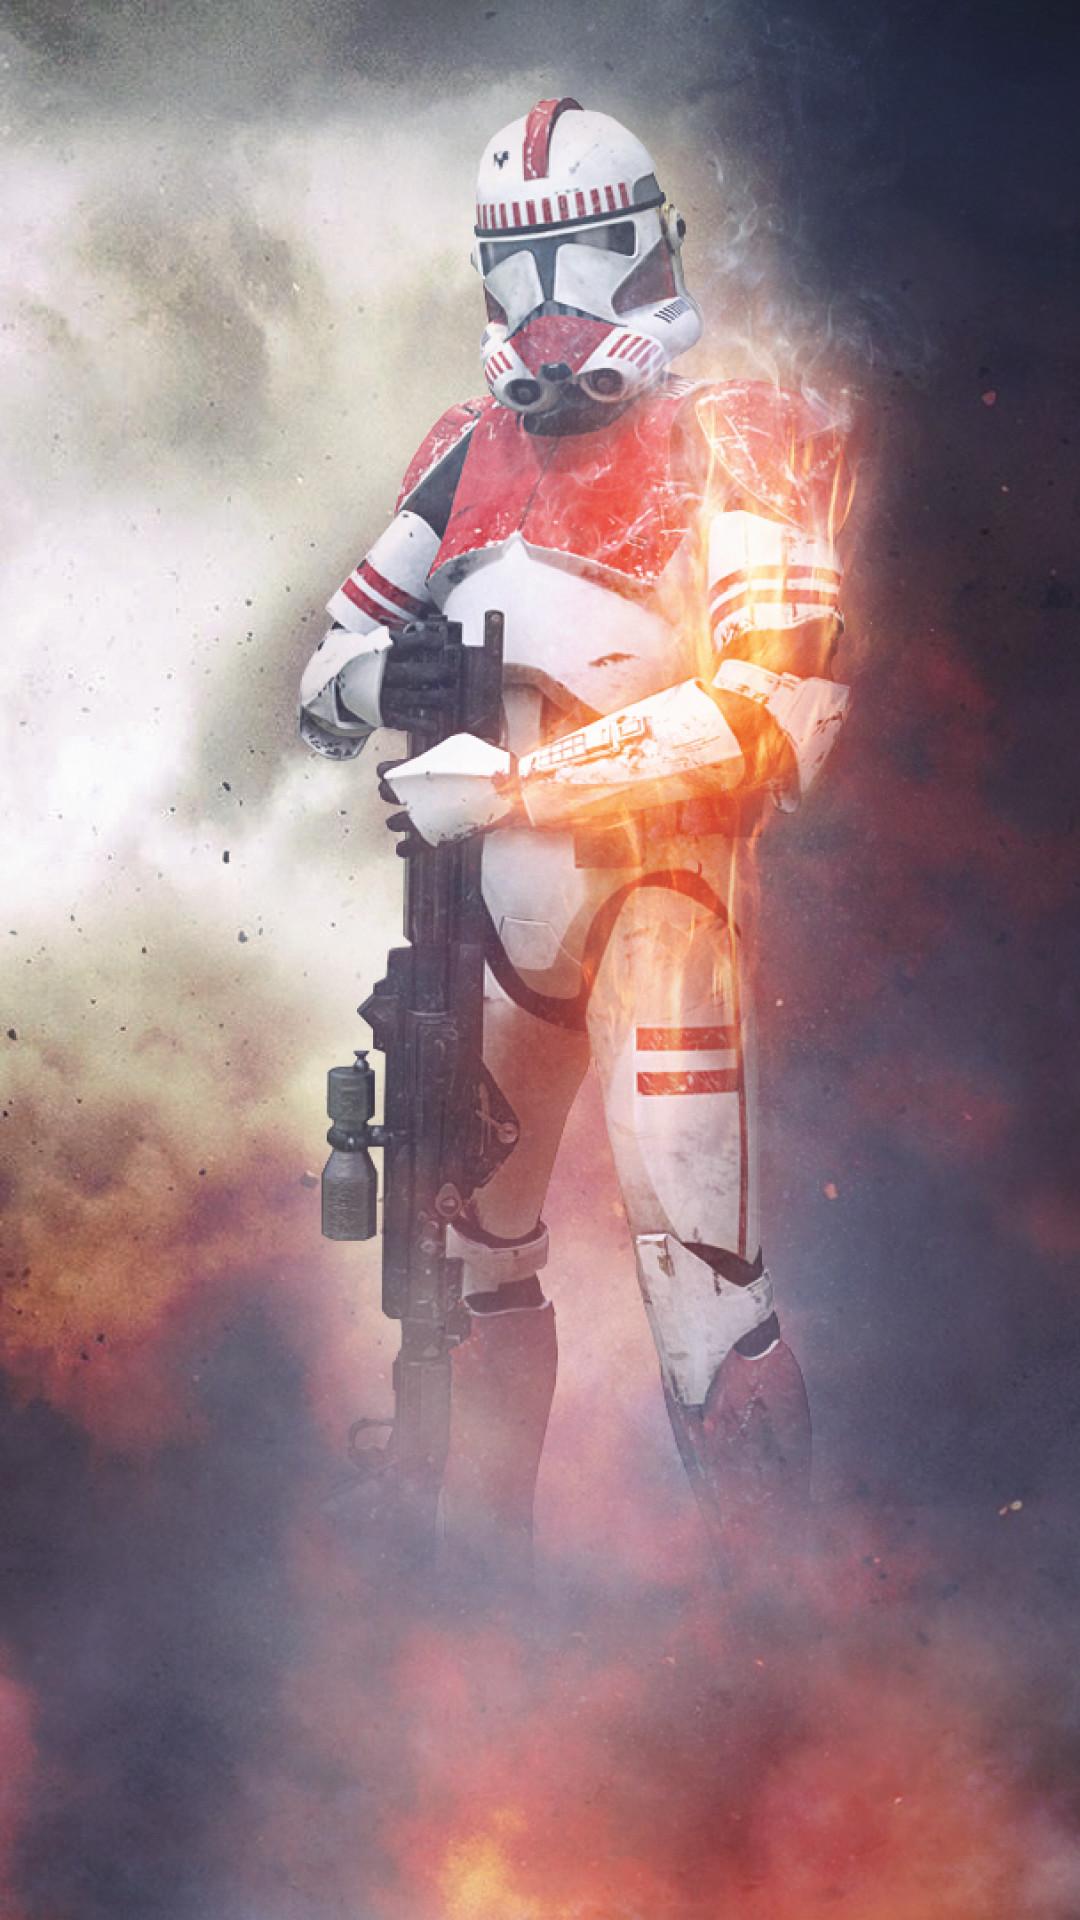 Battlefront 1, Clone Trooper